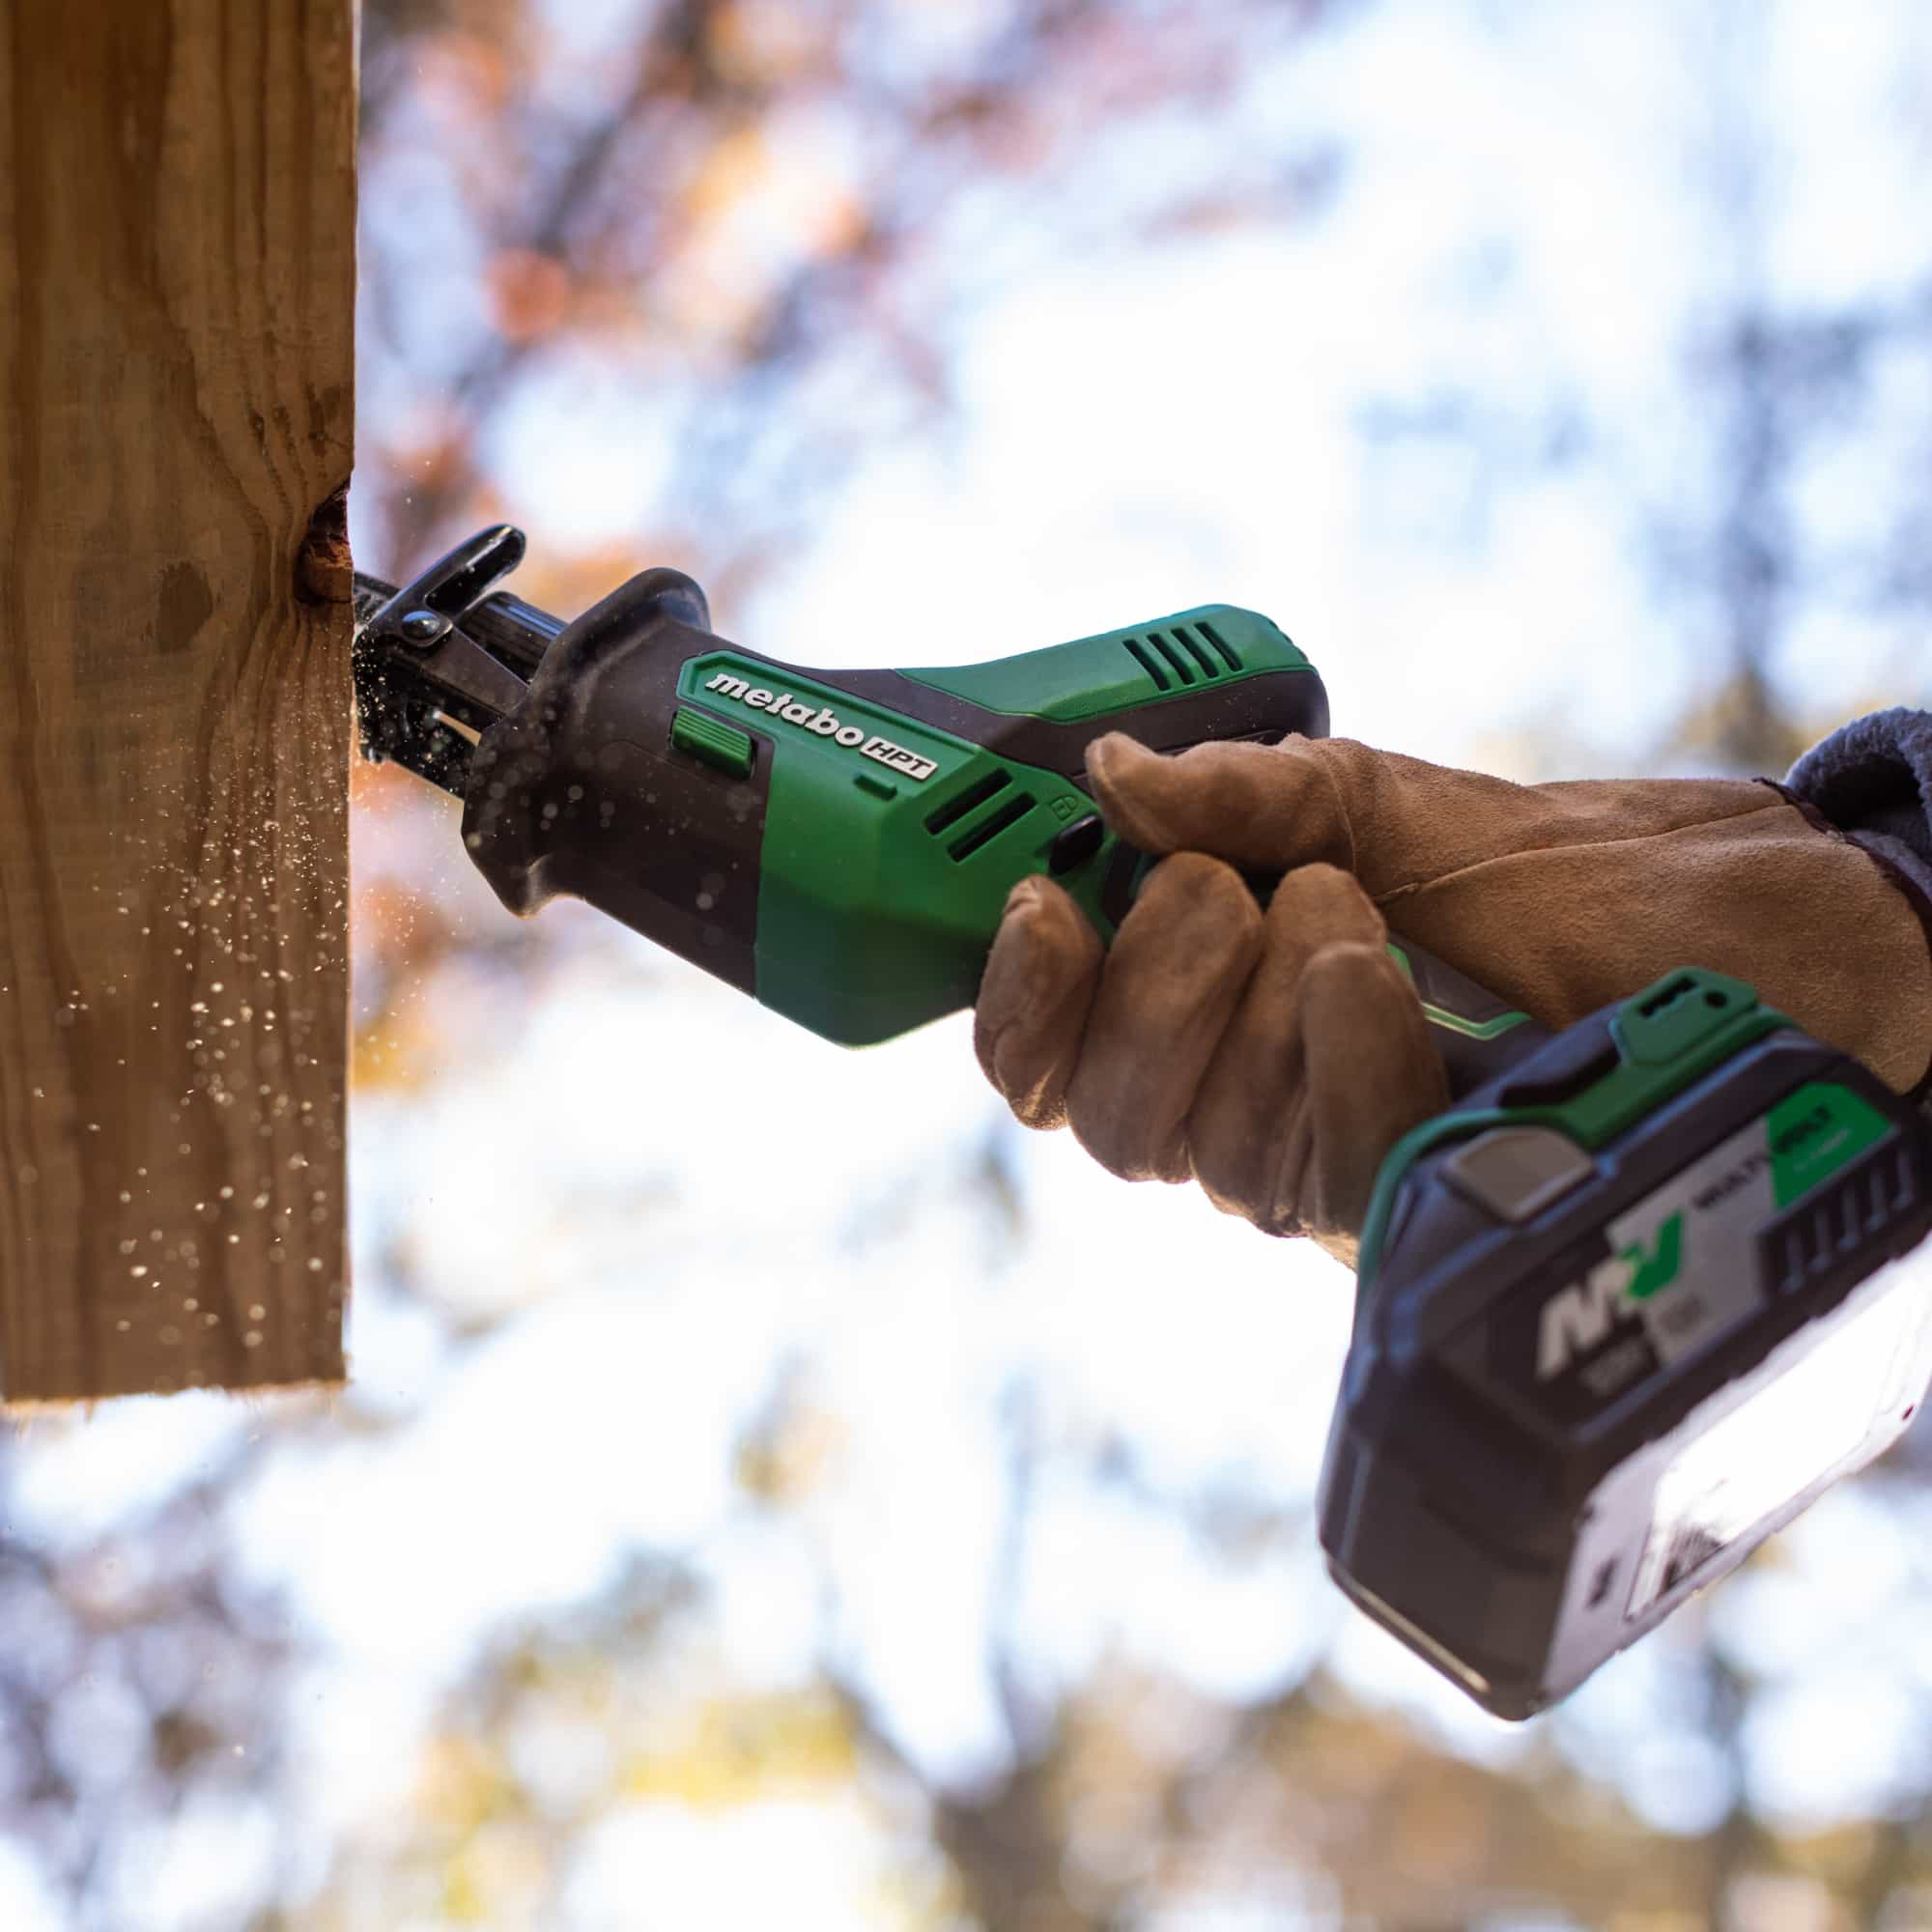 CR18DAQ4 - One handed reciprocating saw